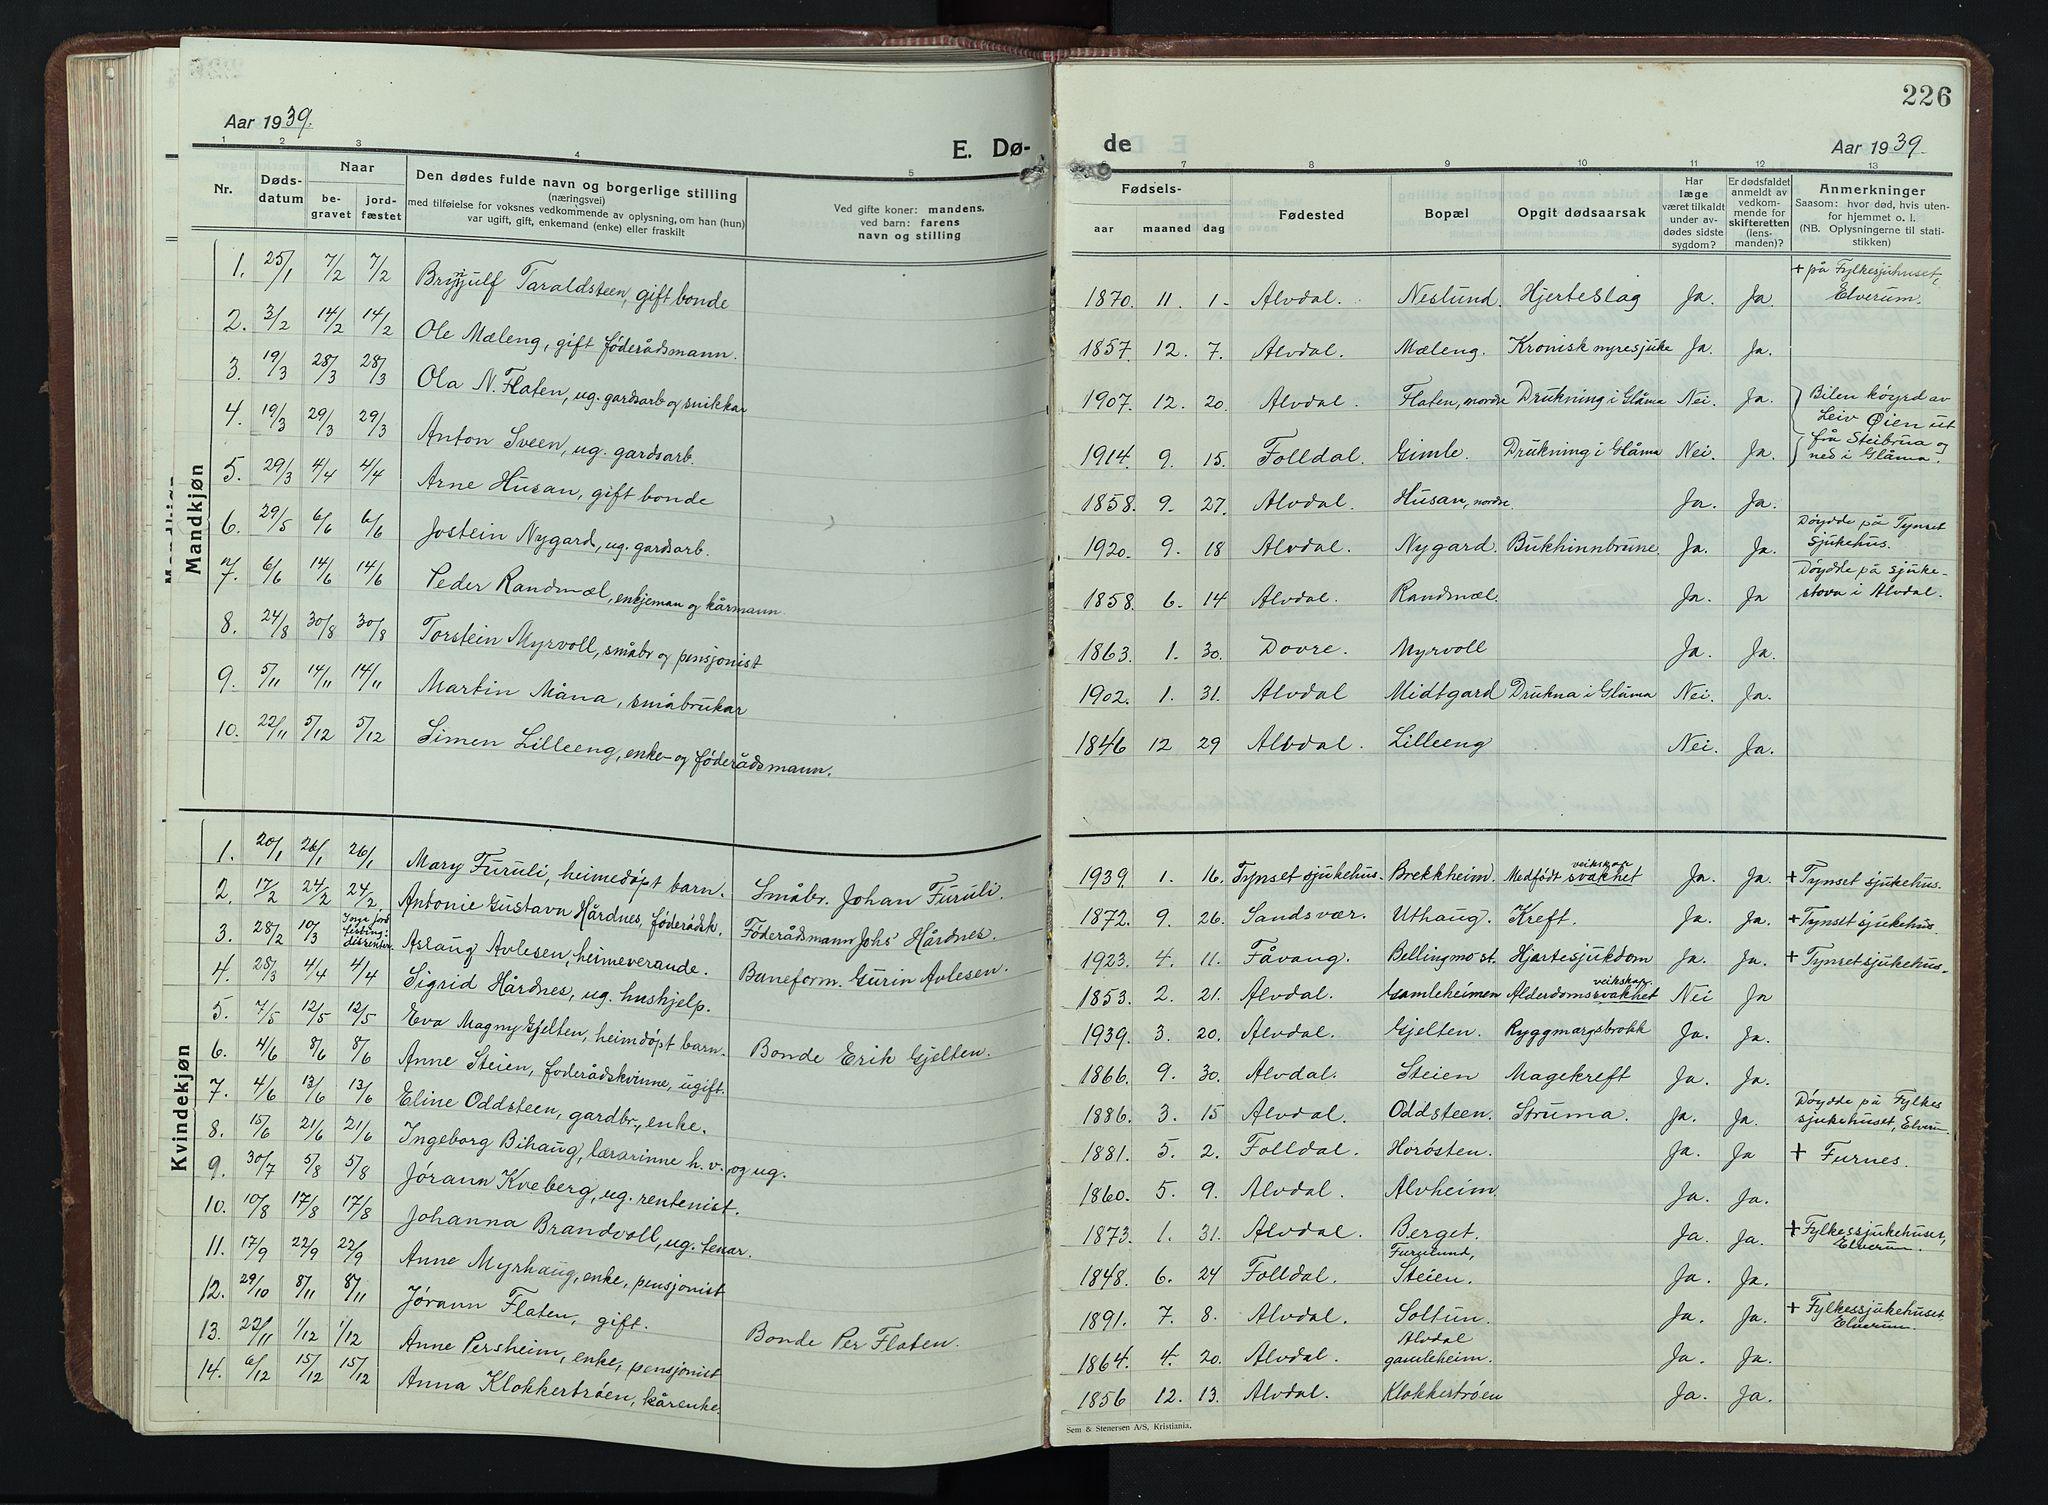 SAH, Alvdal prestekontor, Klokkerbok nr. 7, 1924-1945, s. 226